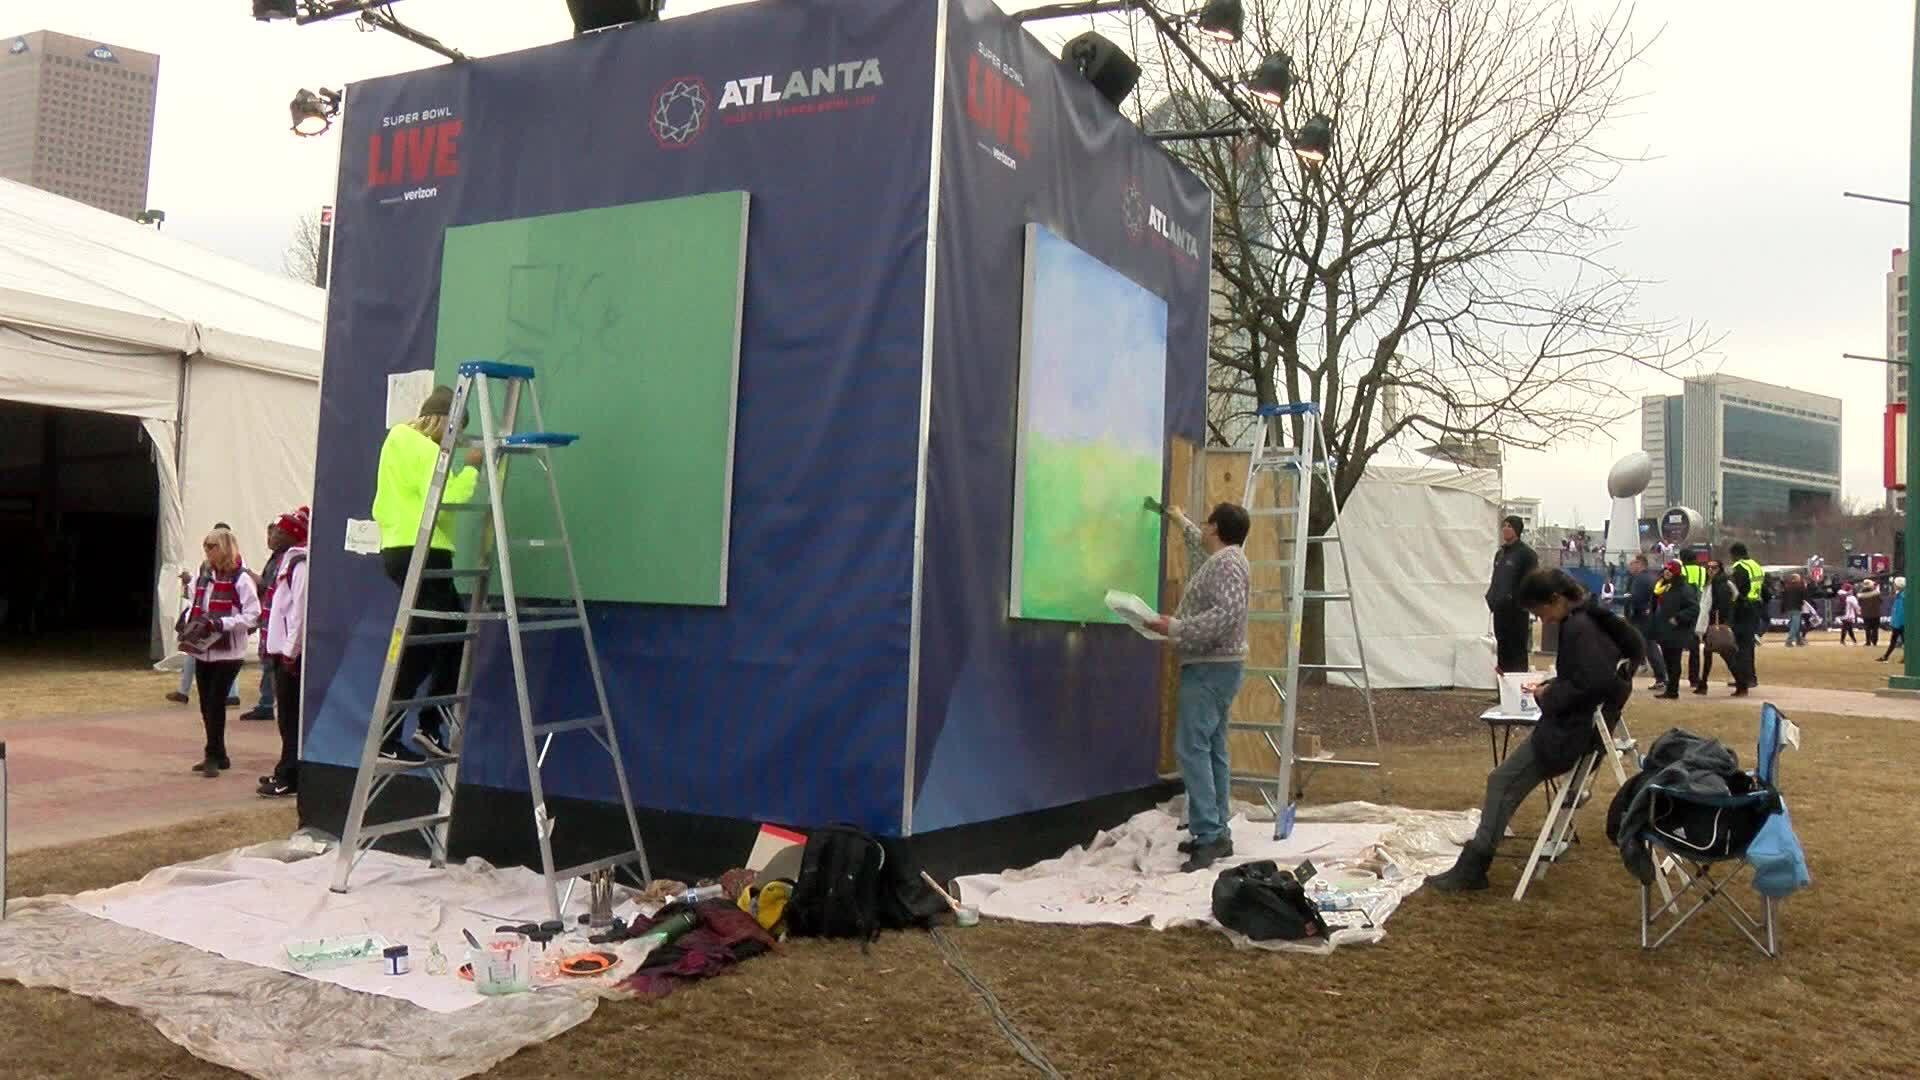 Atlanta artists create new work the week of the big game